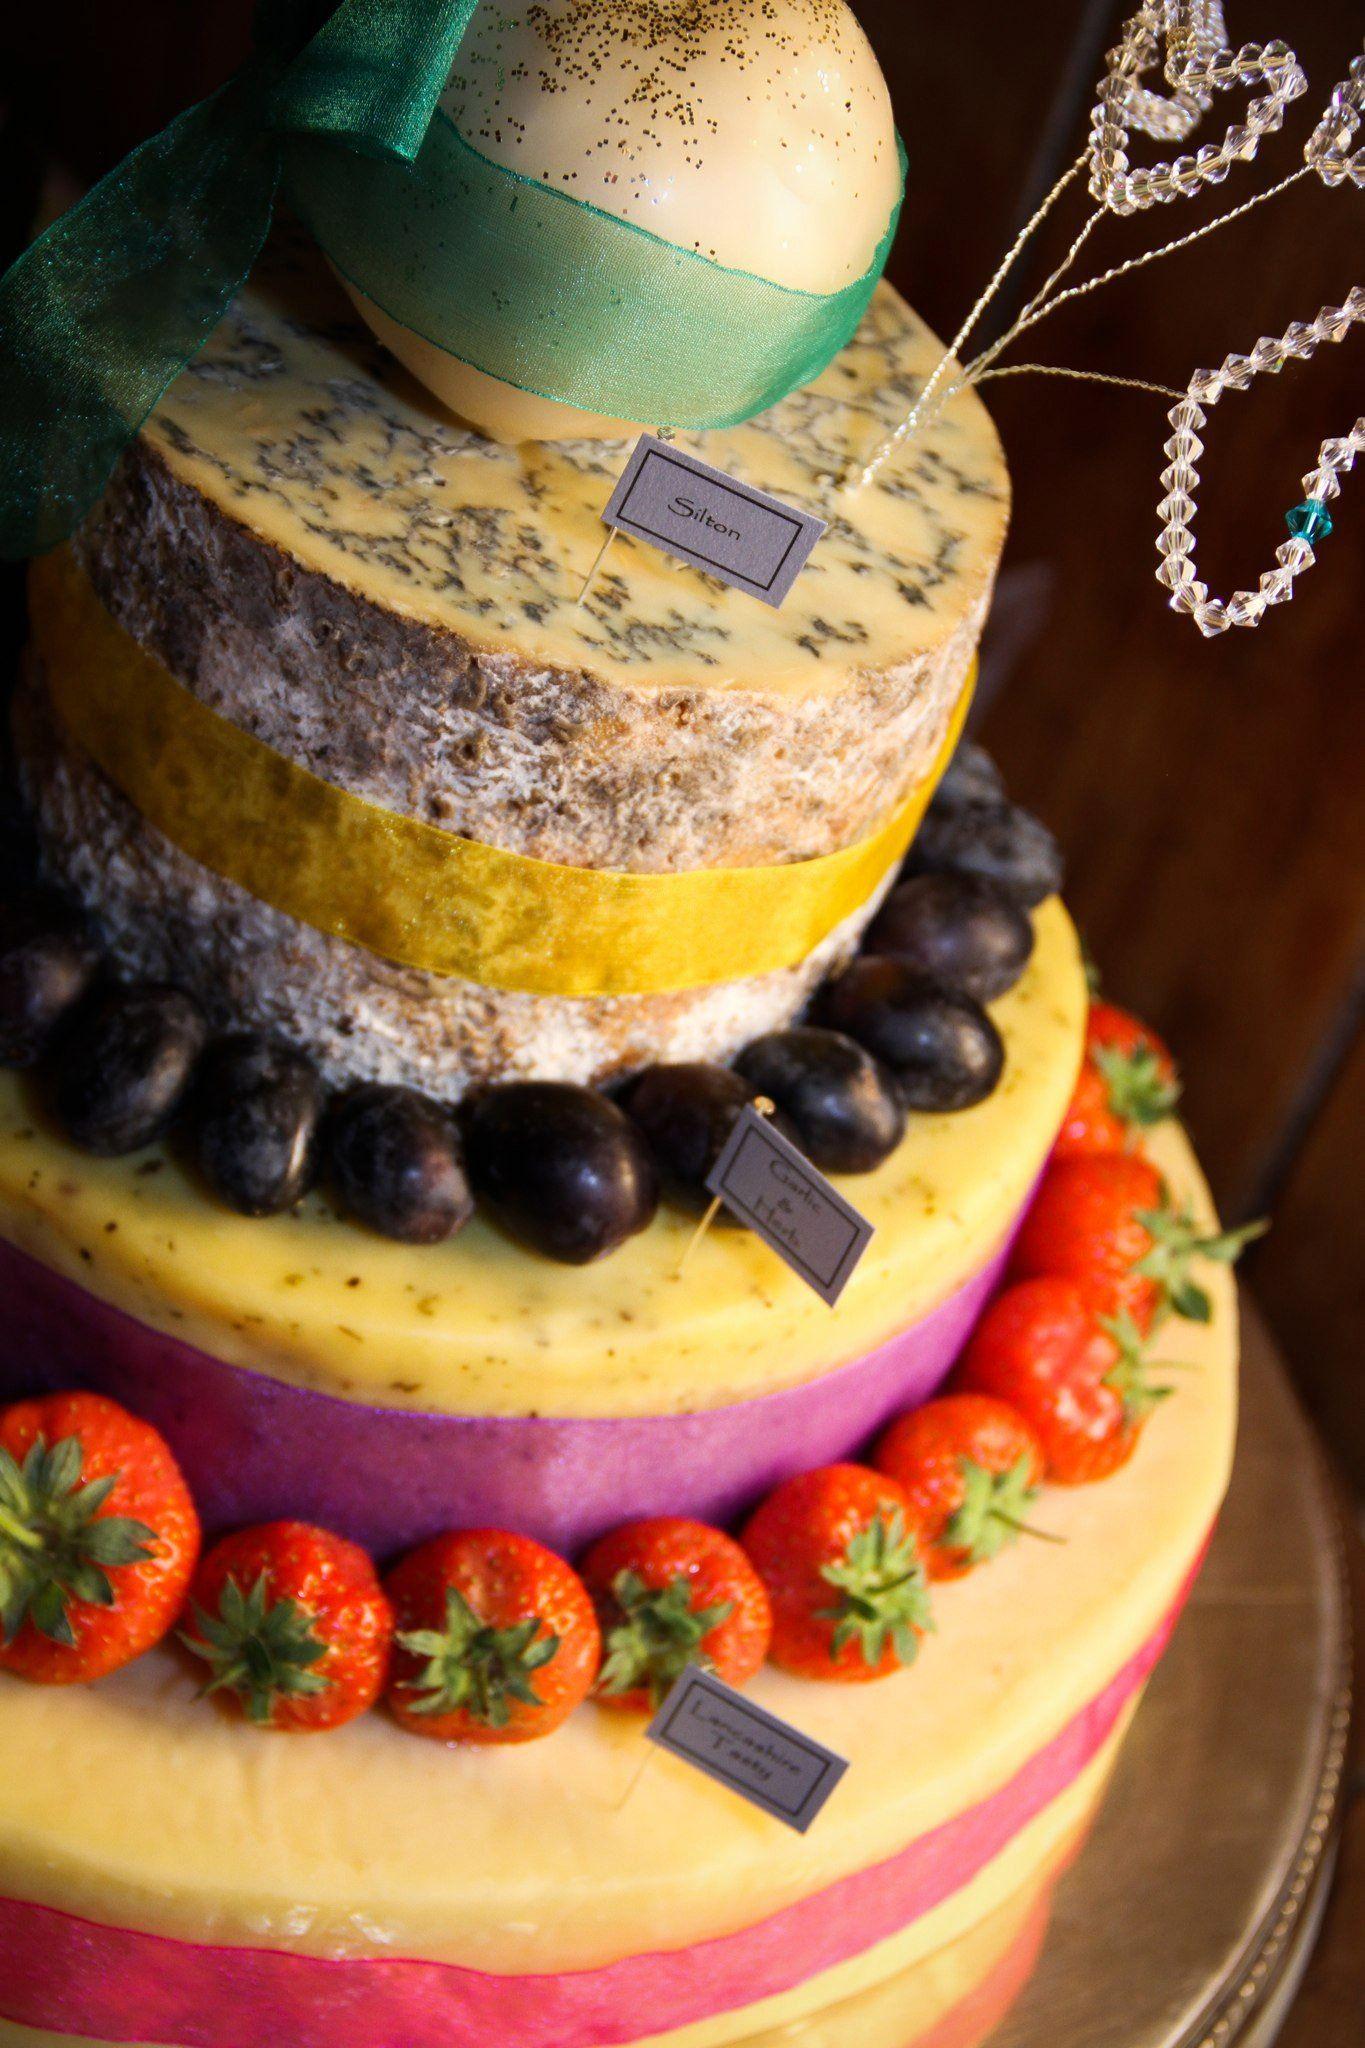 Shorrocks cheese, wedding cakes, Goosnargh, strawberries, fruit ...